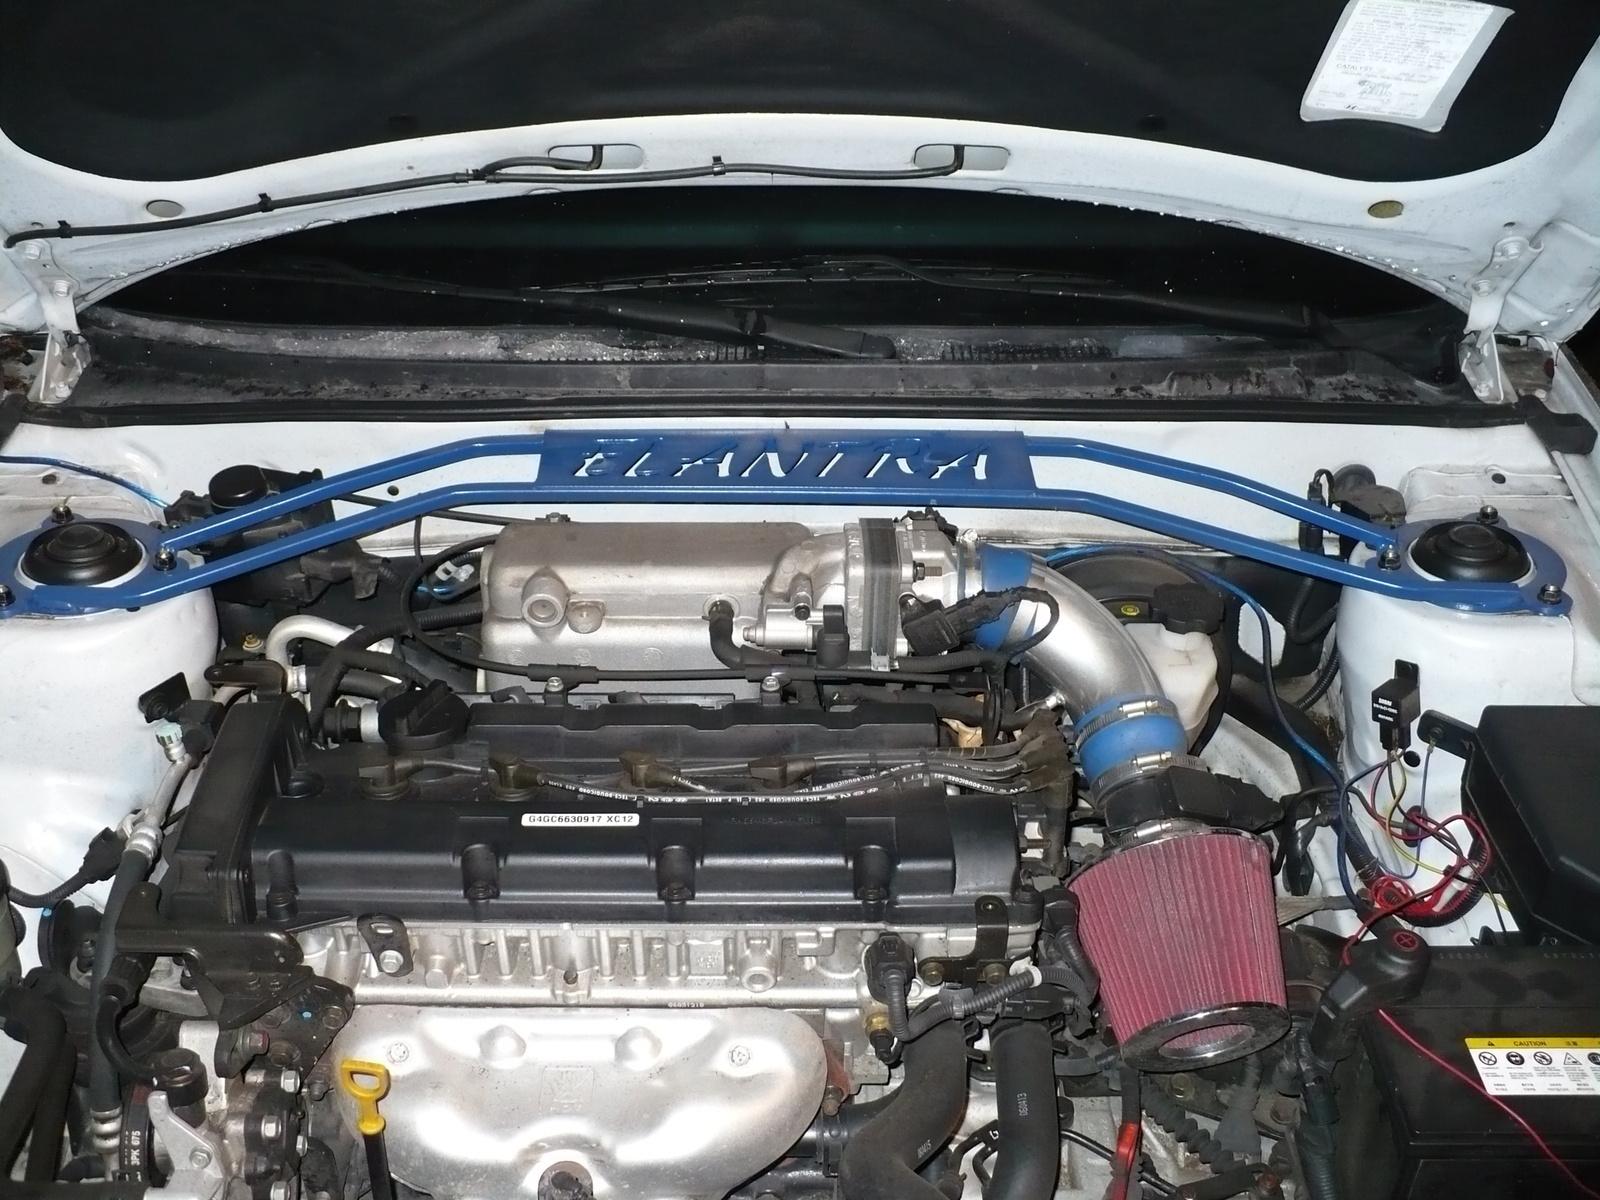 2005 Hyundai Coupe Toyota Camry Solara Sle Convertible 3 Prius Fuse Box 2010 Cover Get Free Image 13 Car Photo